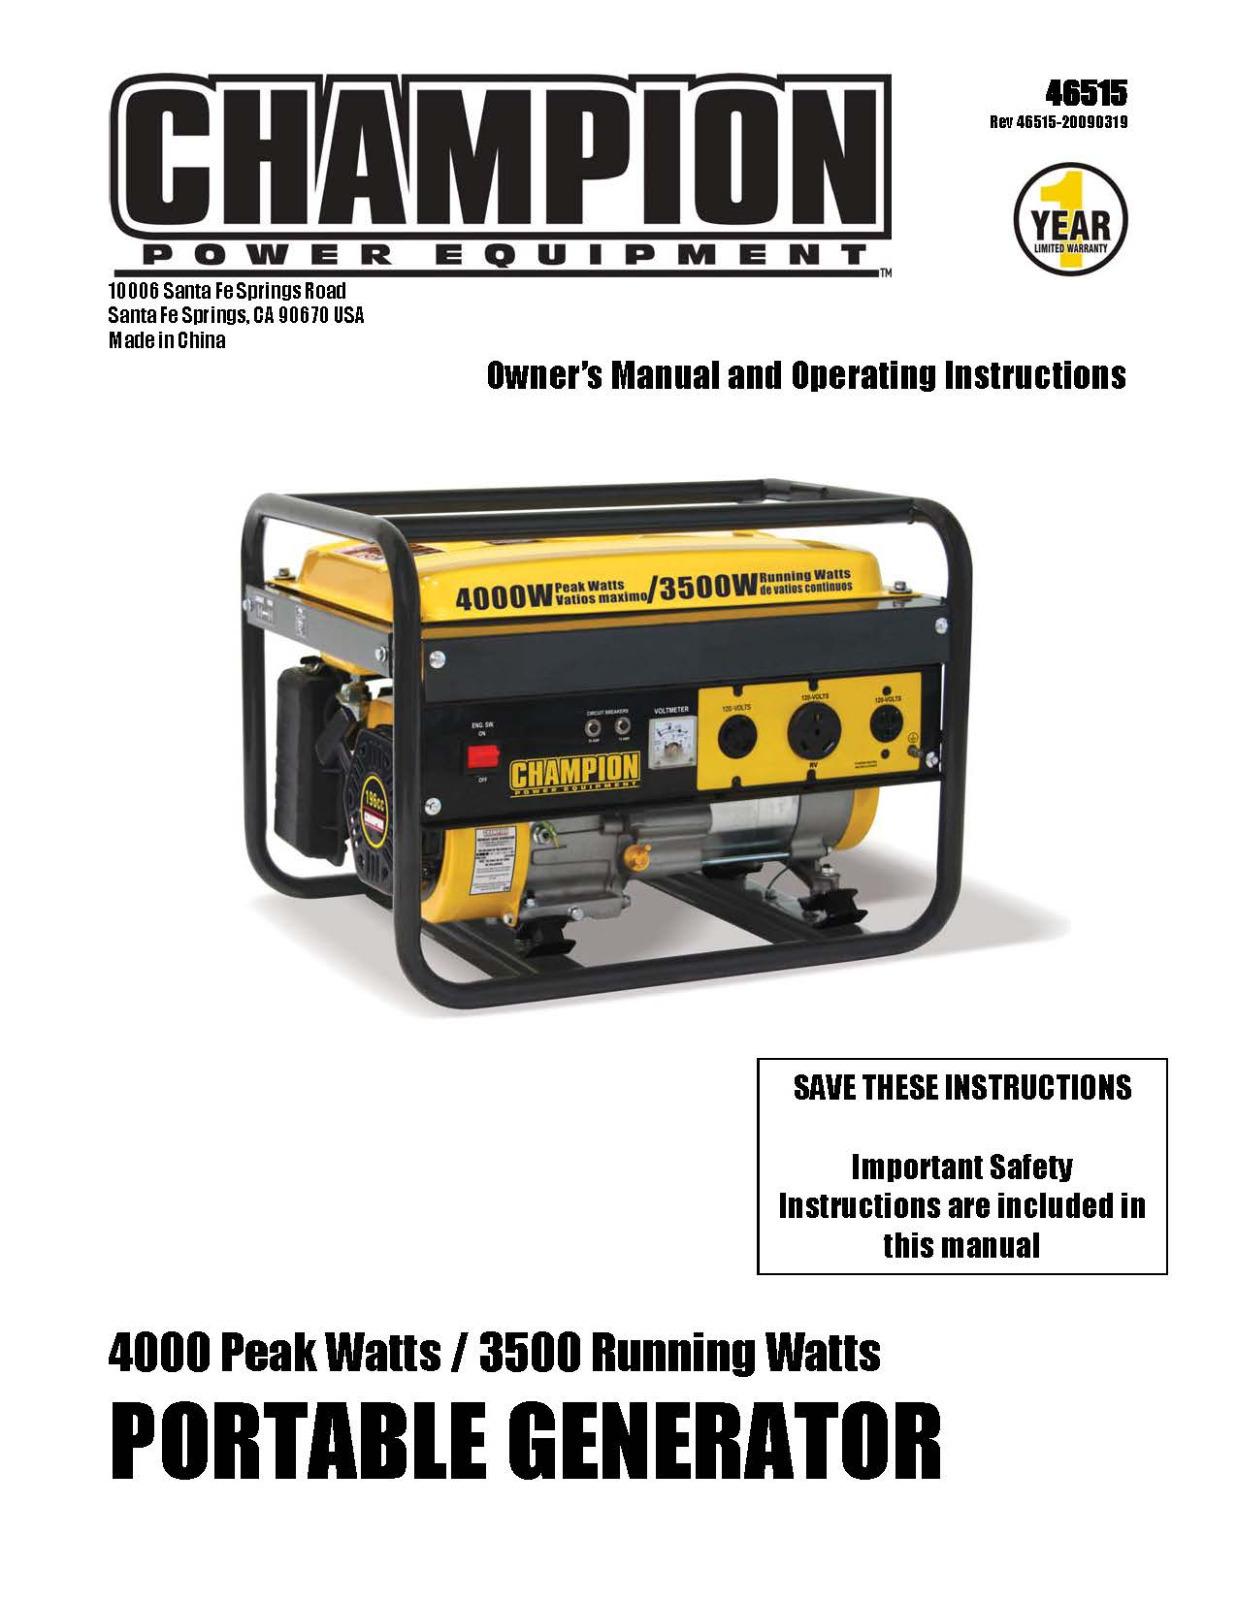 3,500W Generator